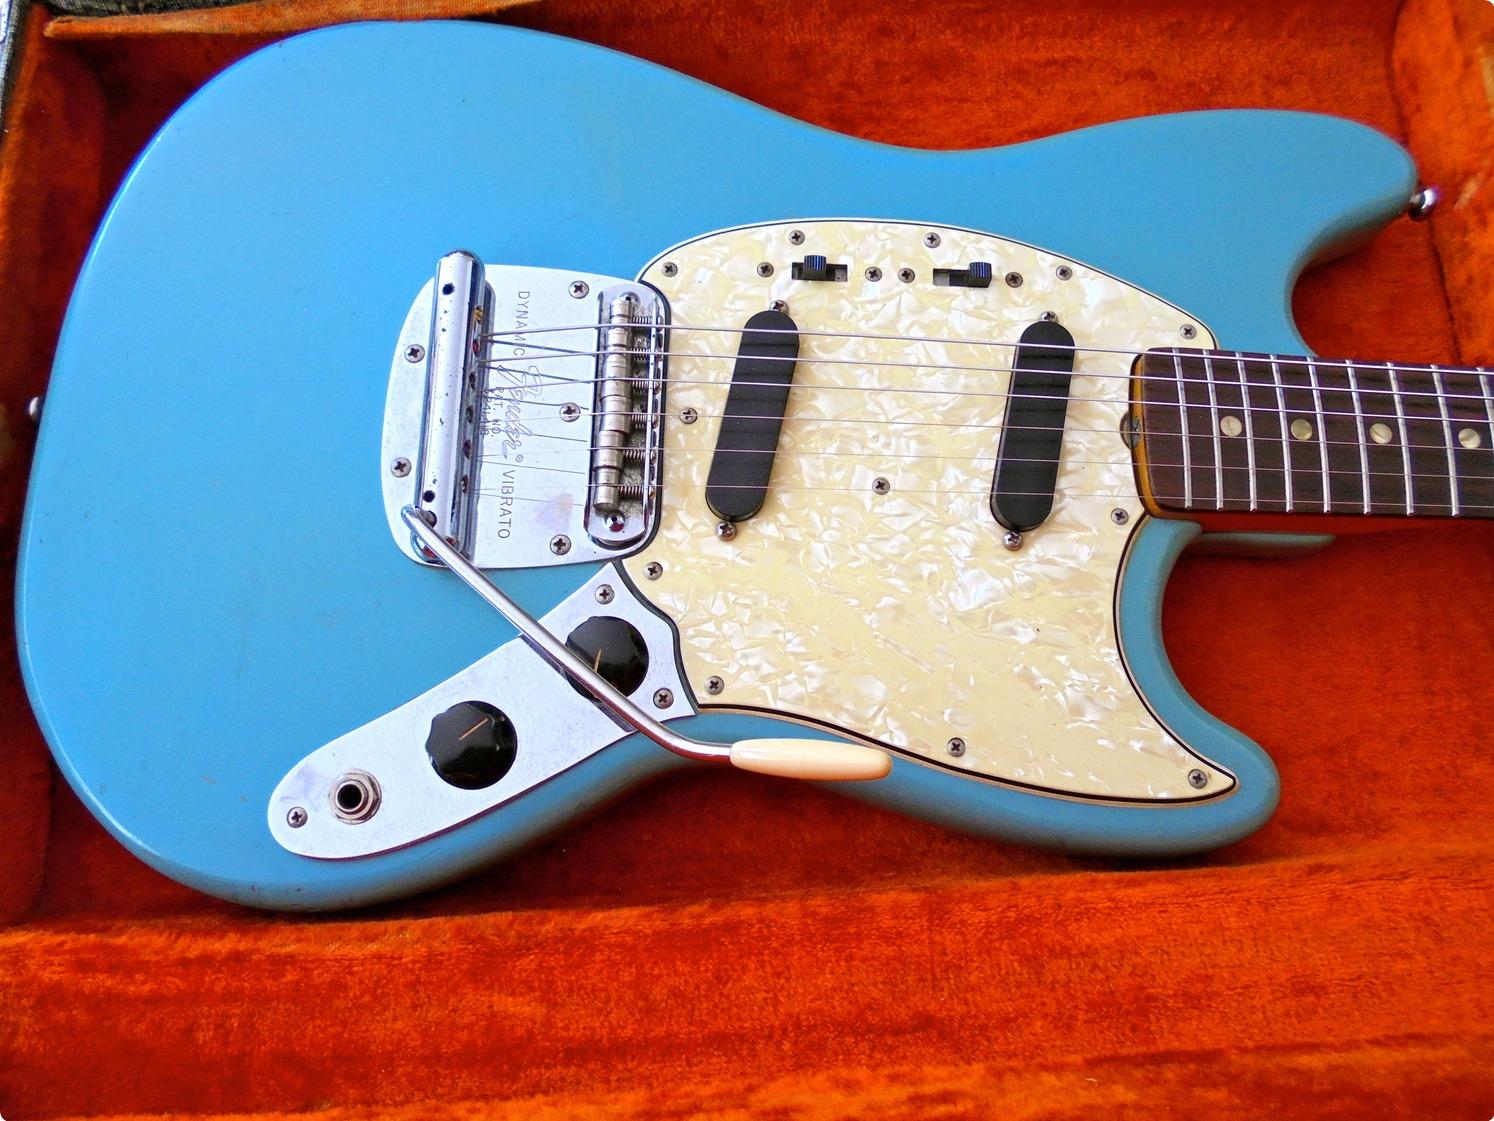 fender mustang 1966 daphne blue guitar for sale pascal waisapy guitars. Black Bedroom Furniture Sets. Home Design Ideas